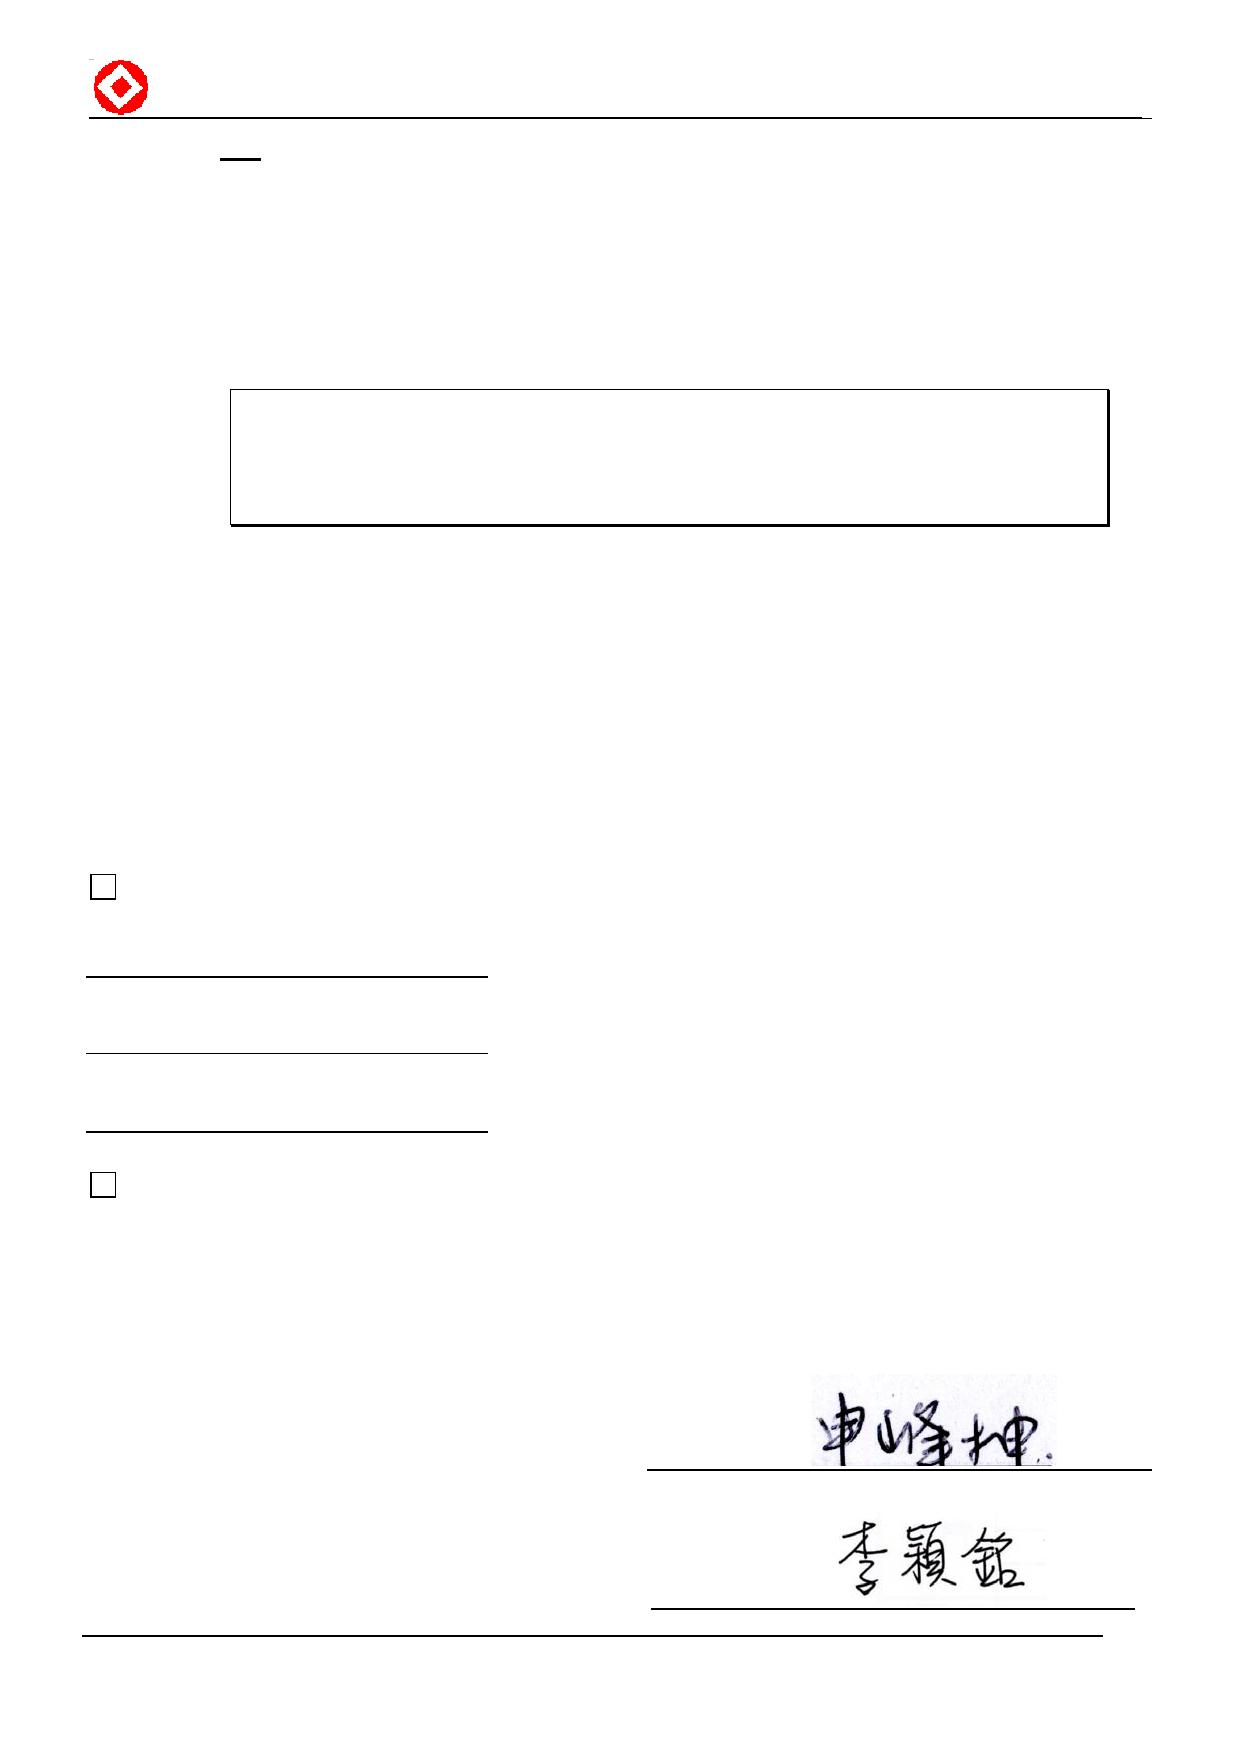 ED060SC7 دیتاشیت PDF